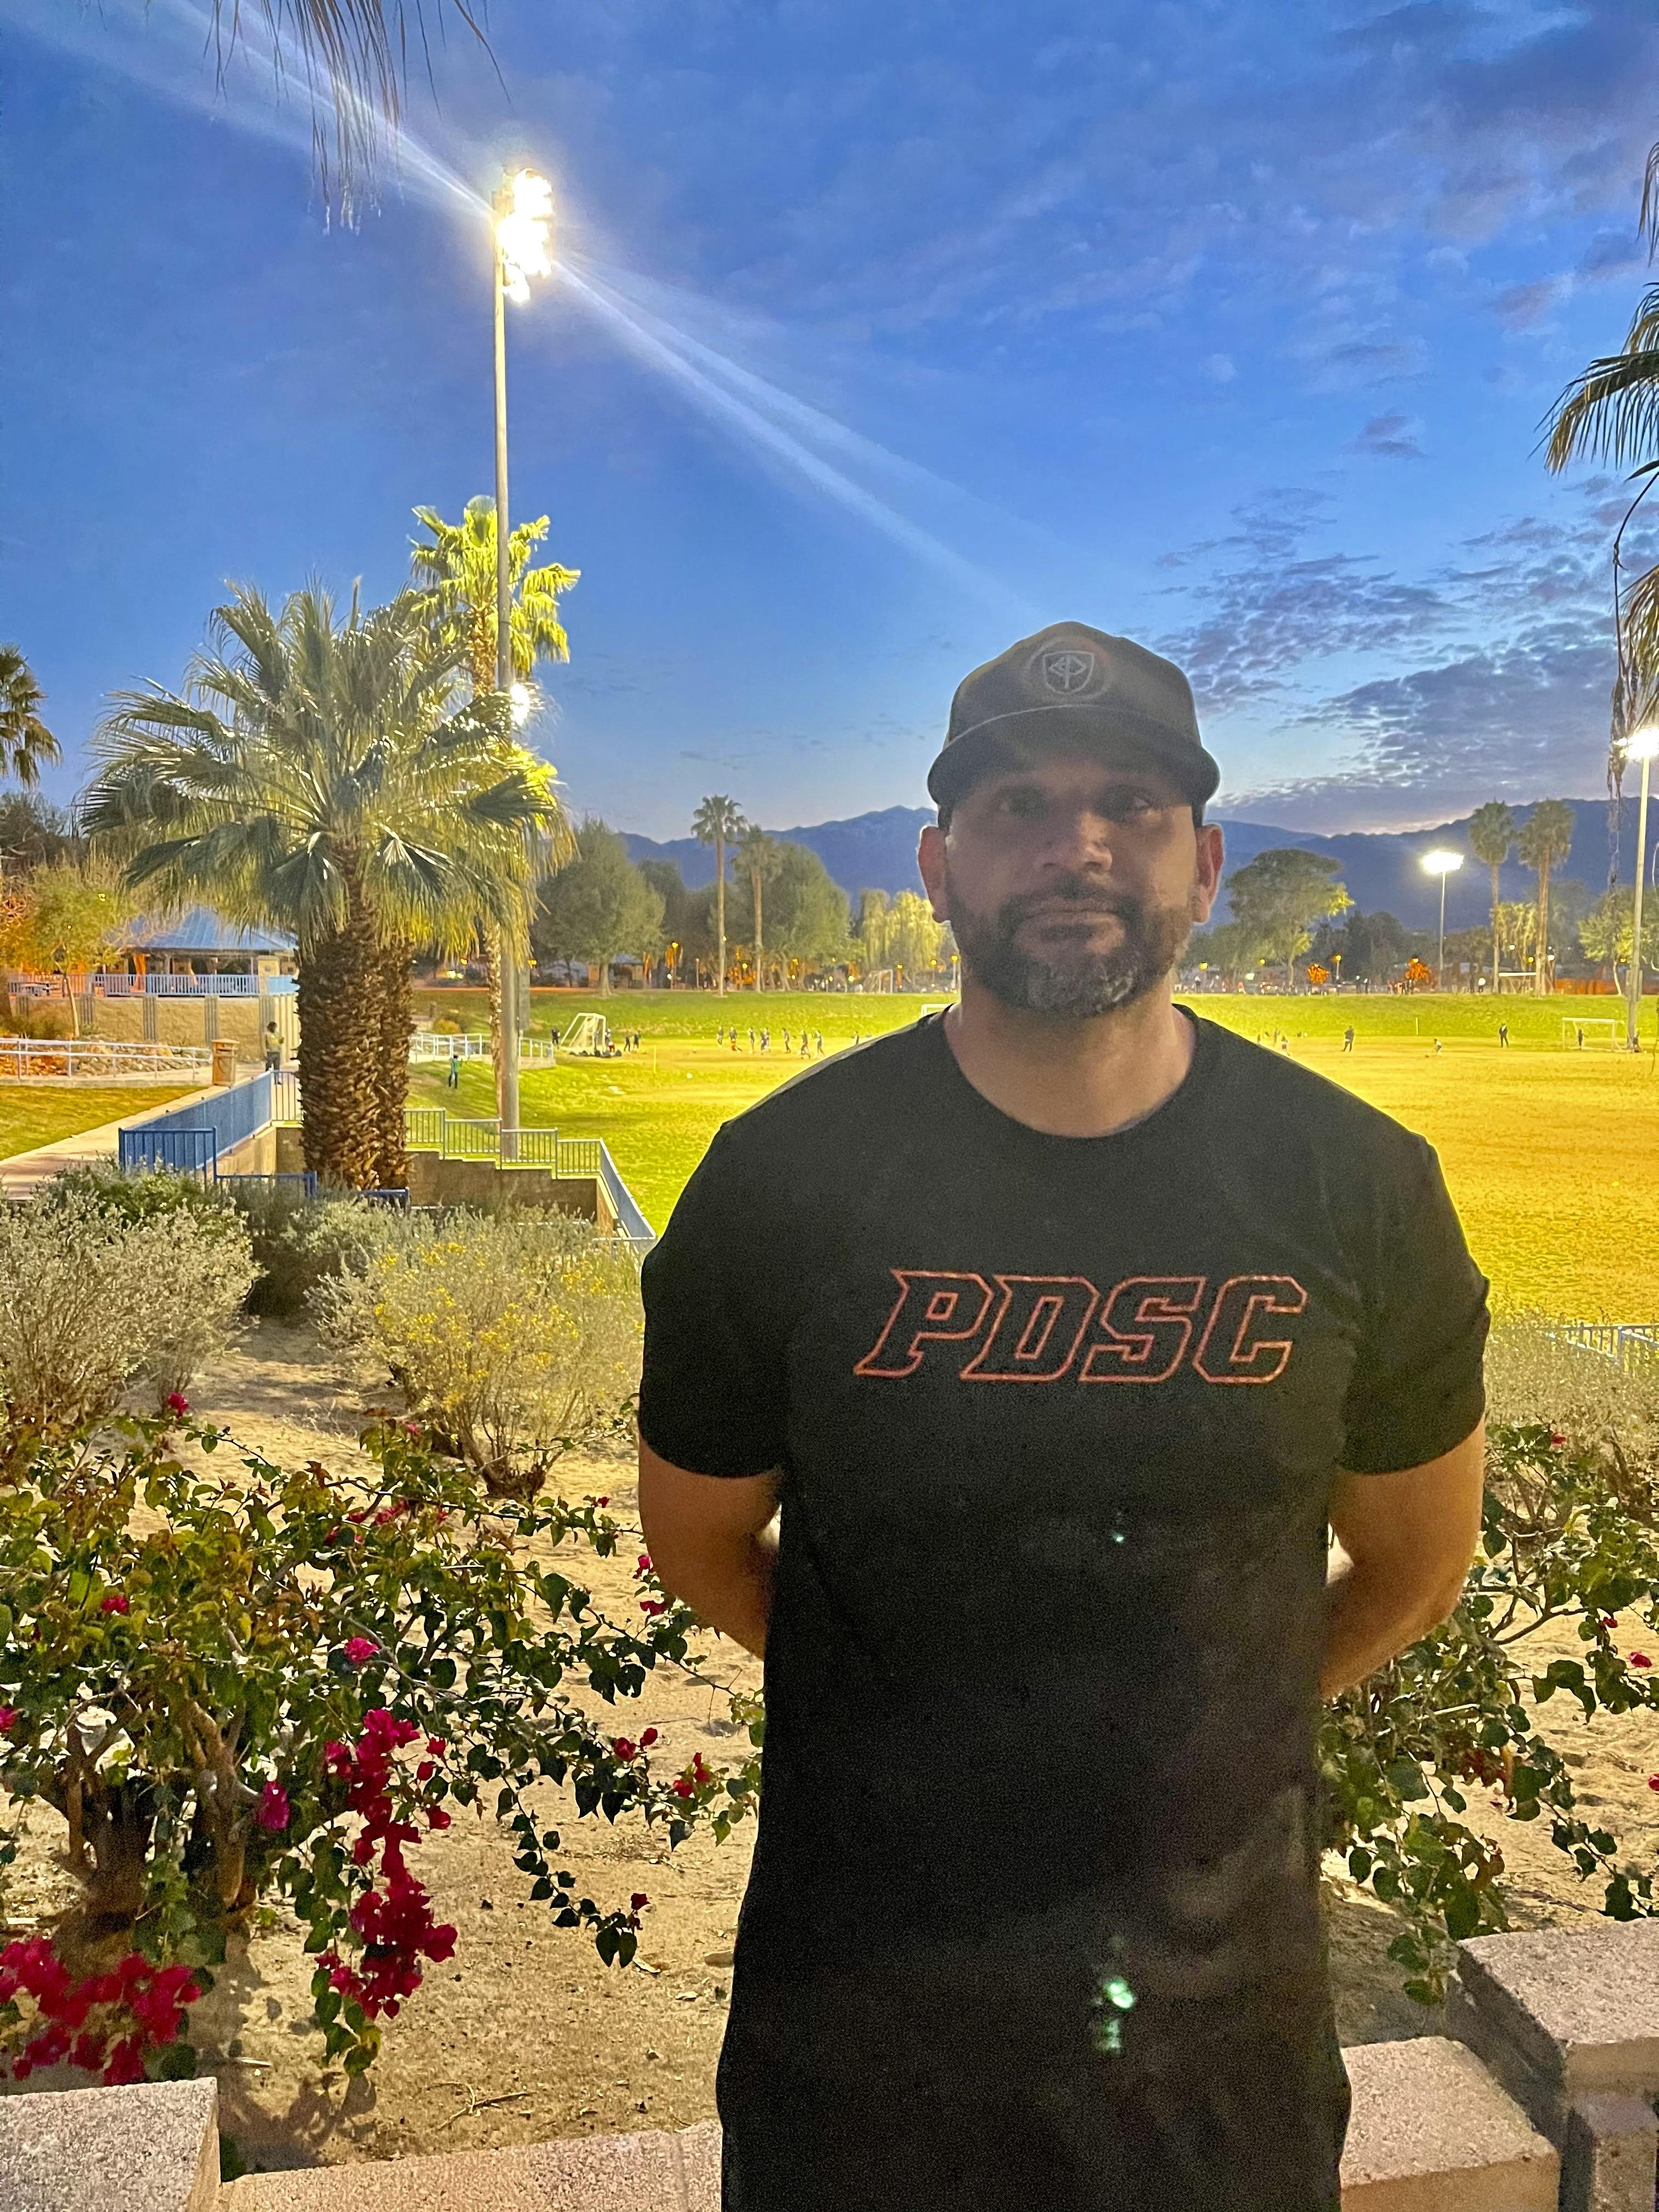 Ricardo B03 and G08 Palm Desert Soccer Club